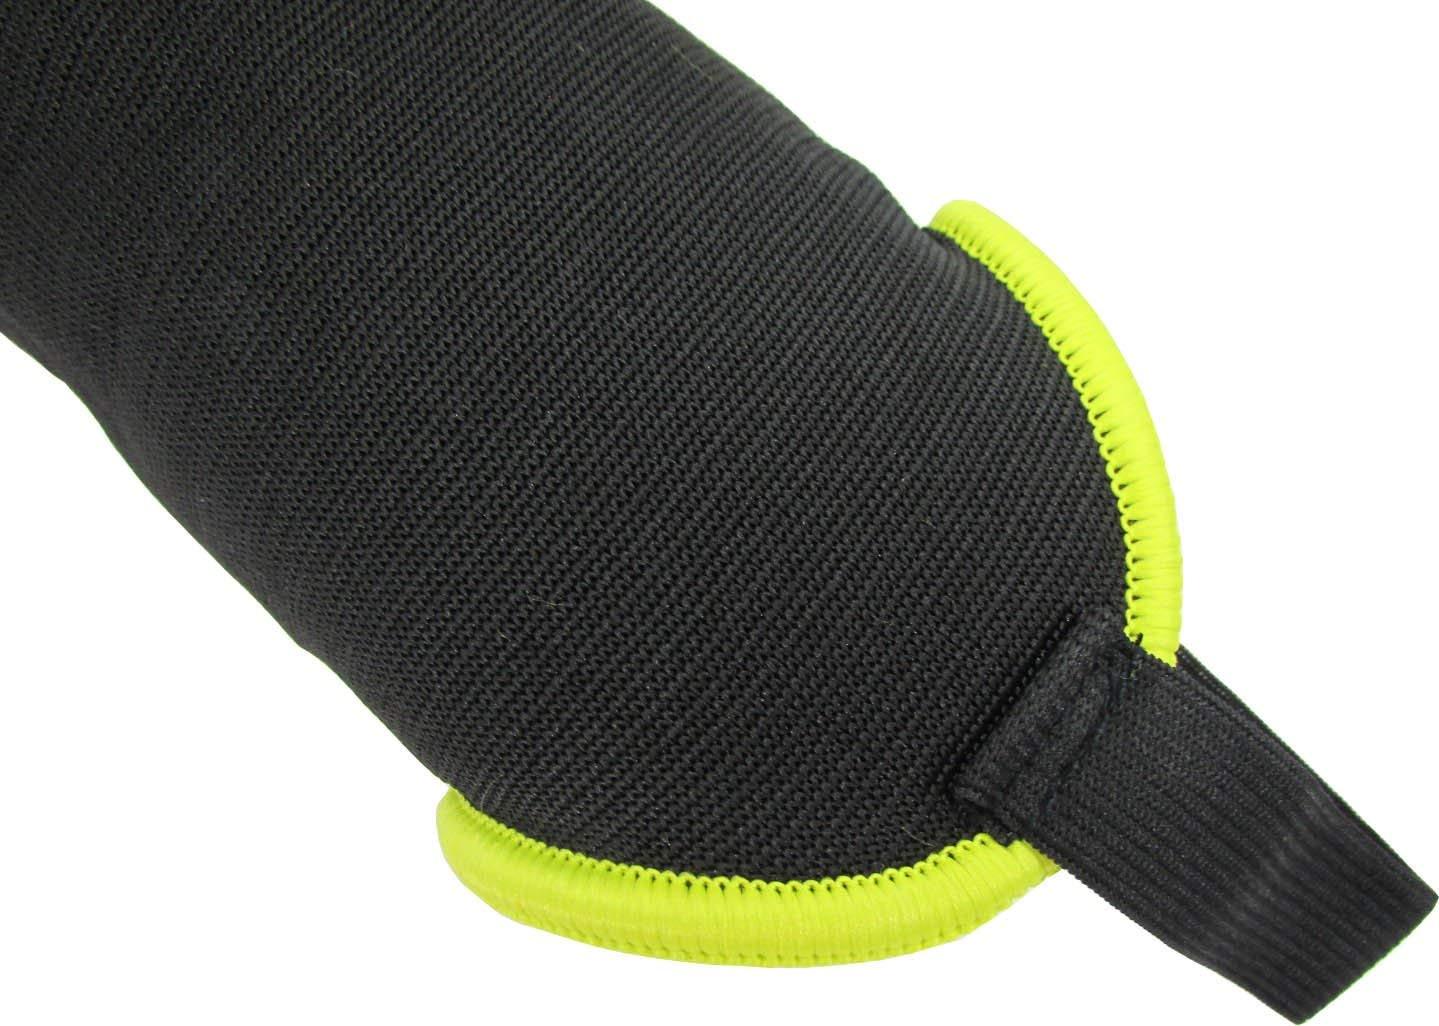 Renewed Vizari Malaga Soccer Shin Guards for Kids Adjustable Straps Soccer Gear for Boys Girls Protective Soccer Equipment